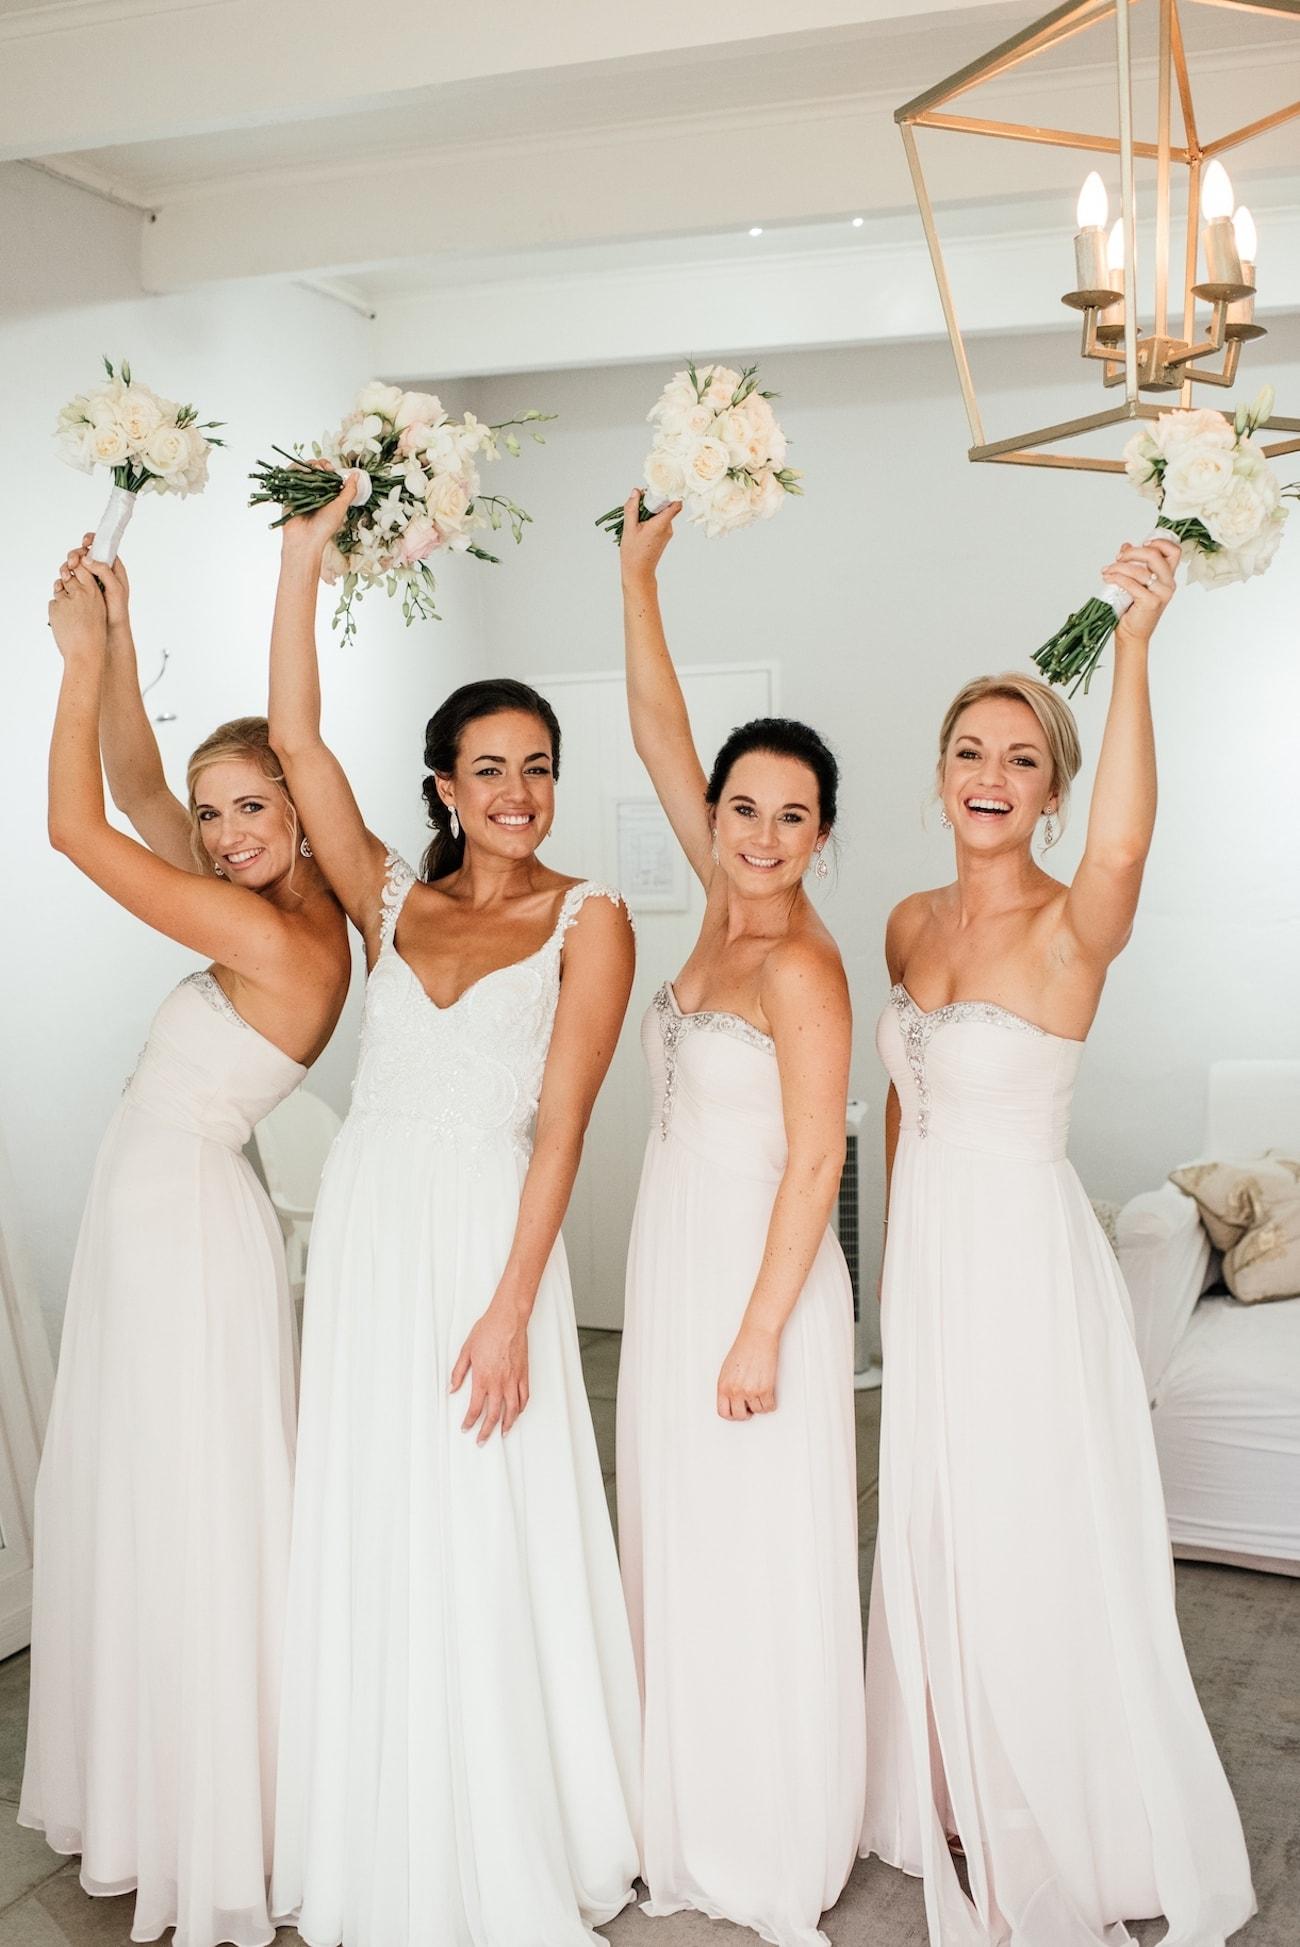 Blush Bridesmaids   Image: Carla Adel